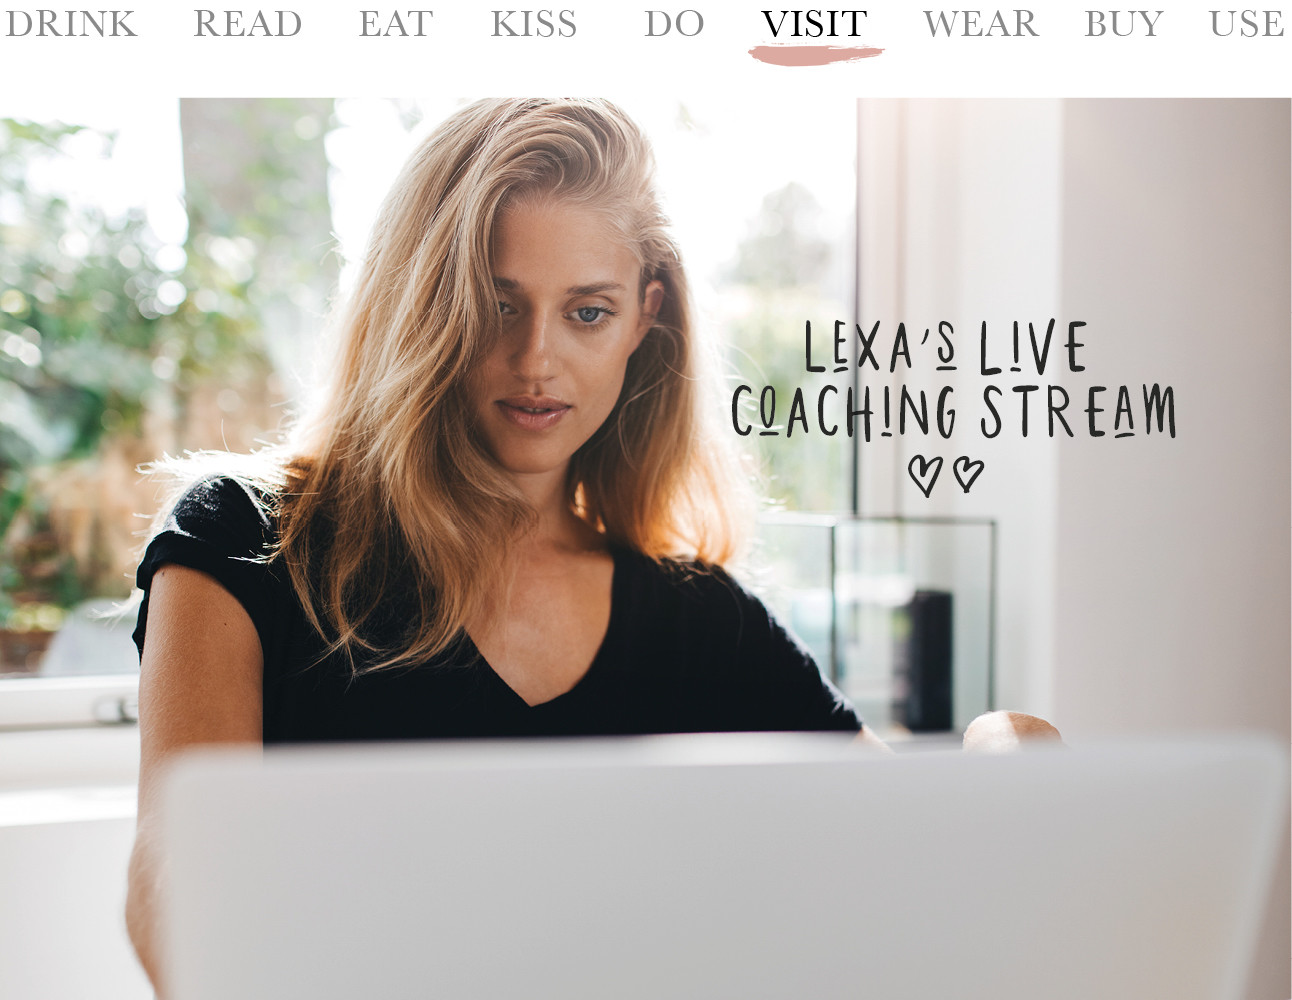 Today we visit Lexa's live coaching stream